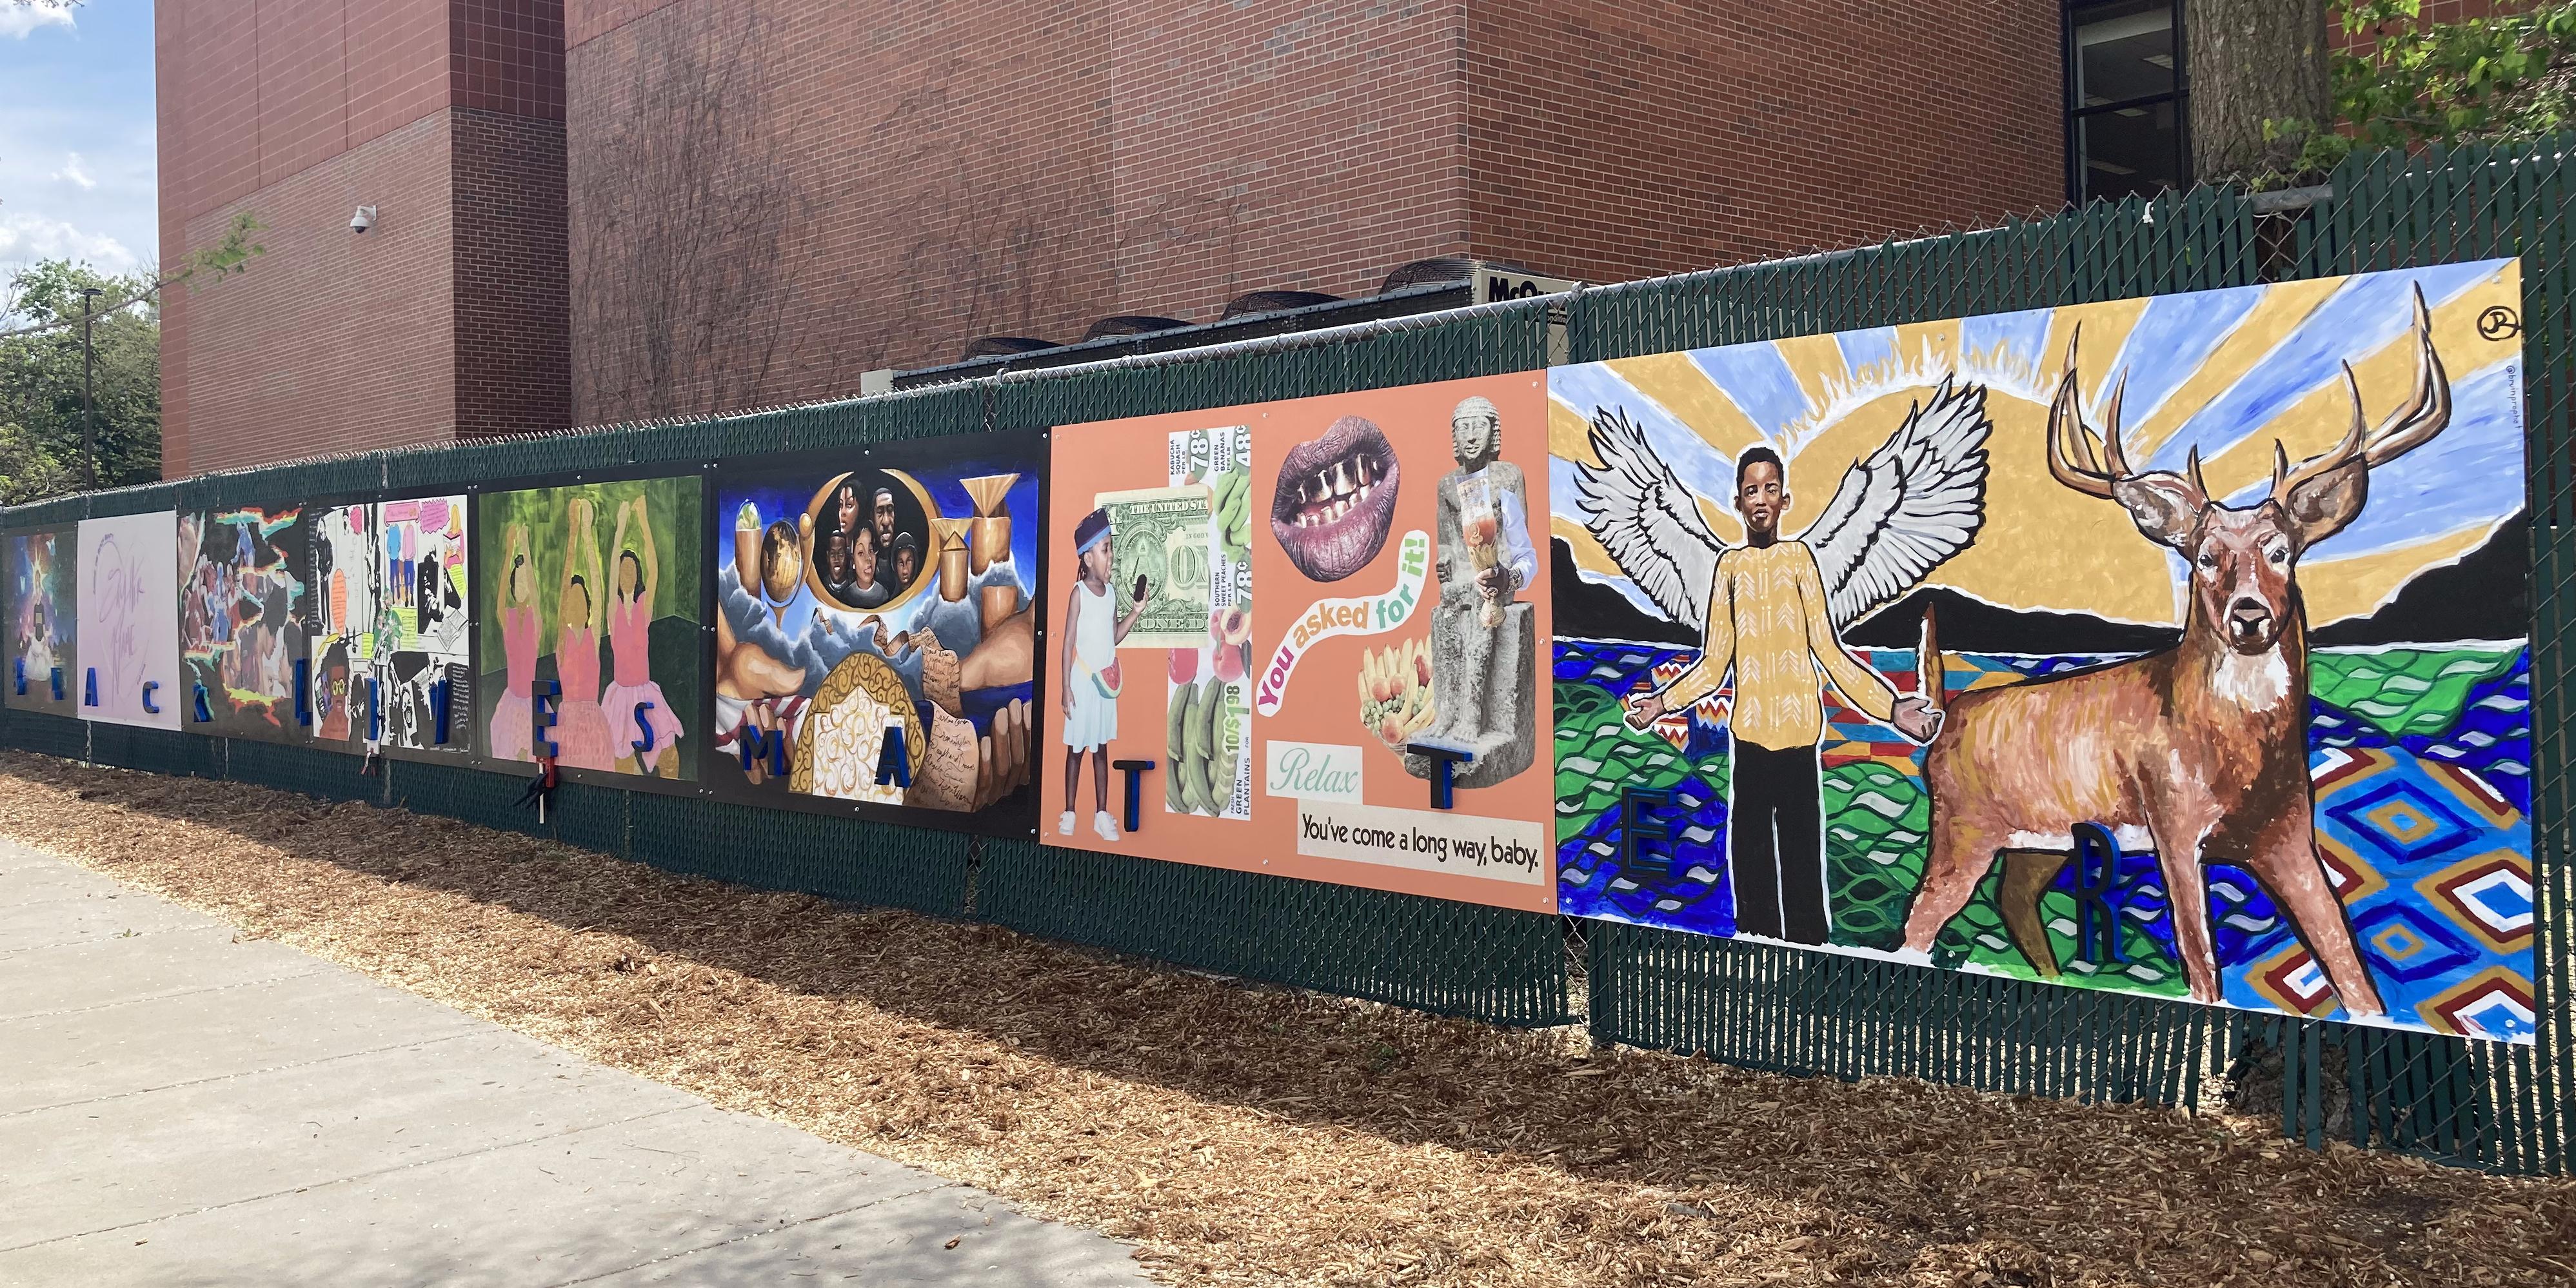 The AADL Black Lives Matter Mural